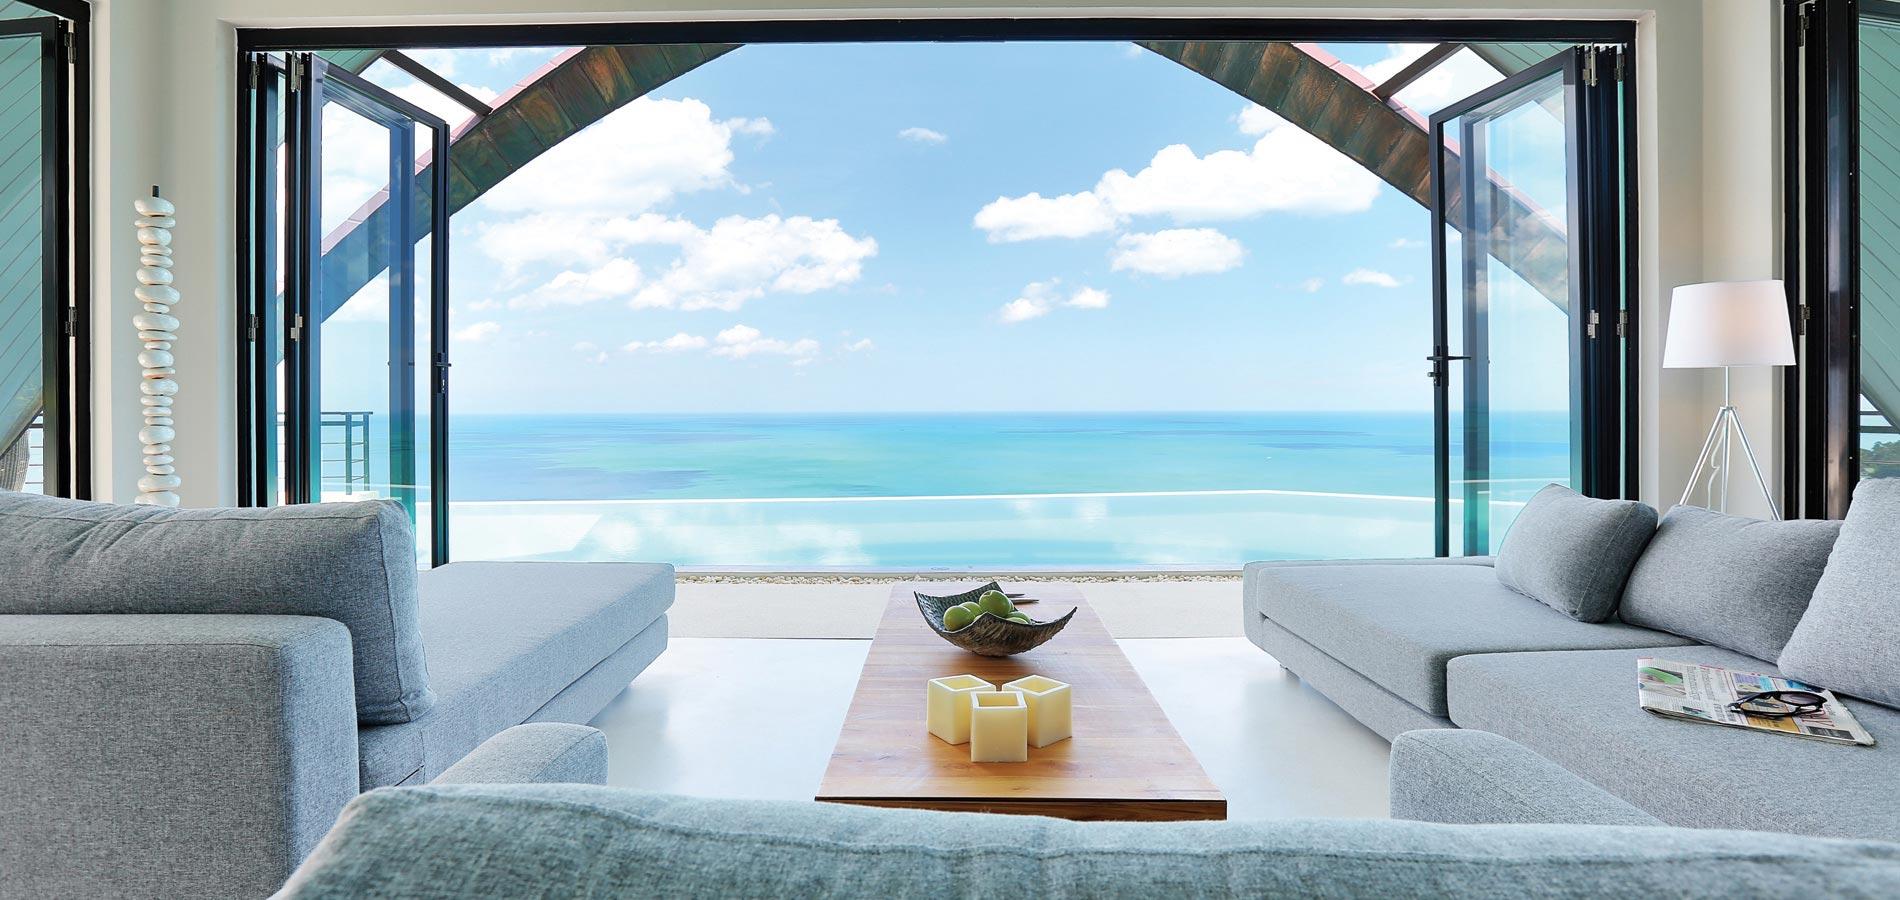 Villa with panoramic seaview